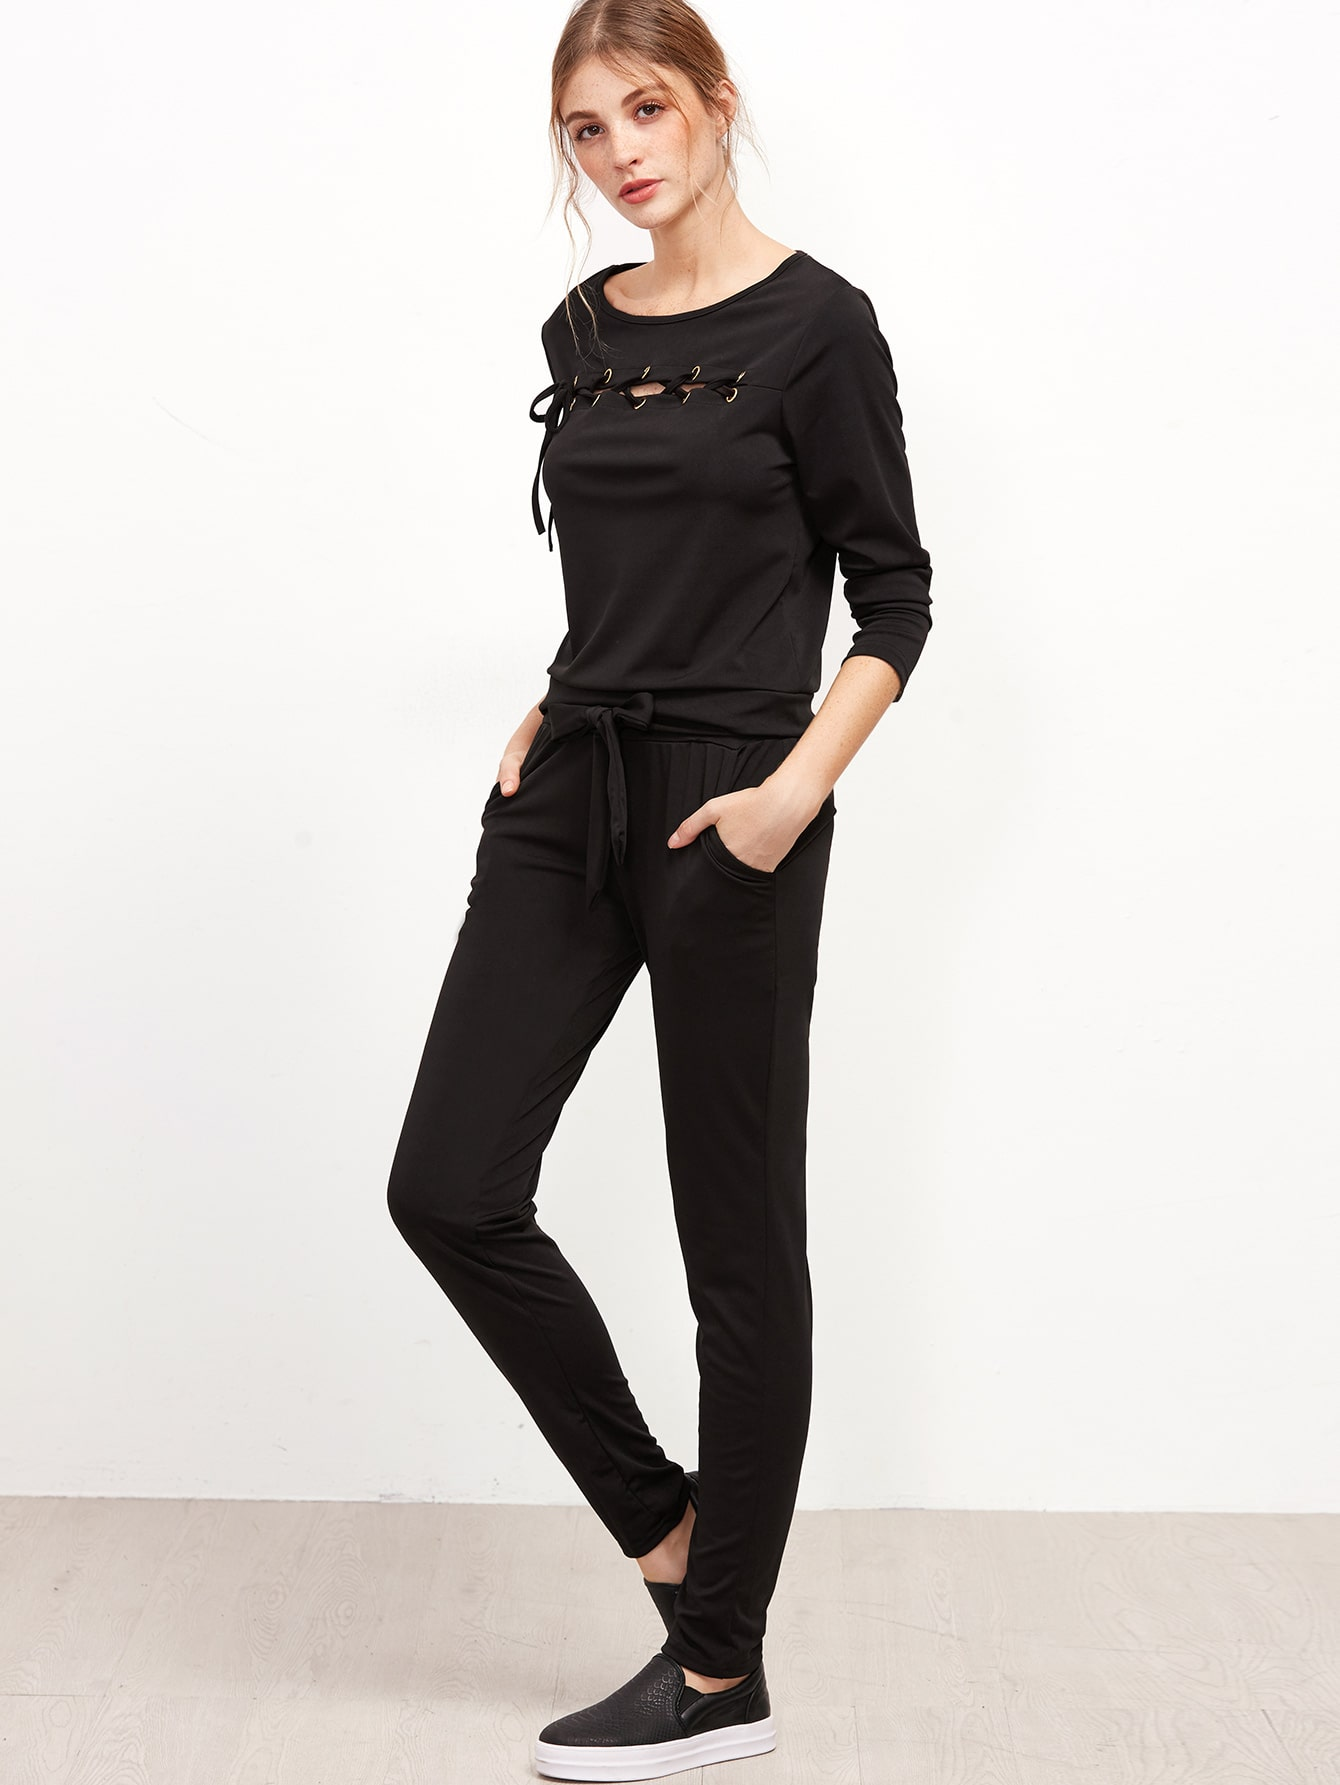 Black Eyelet Lace Up Trim Sweatshirt With Pants twopiece160927302